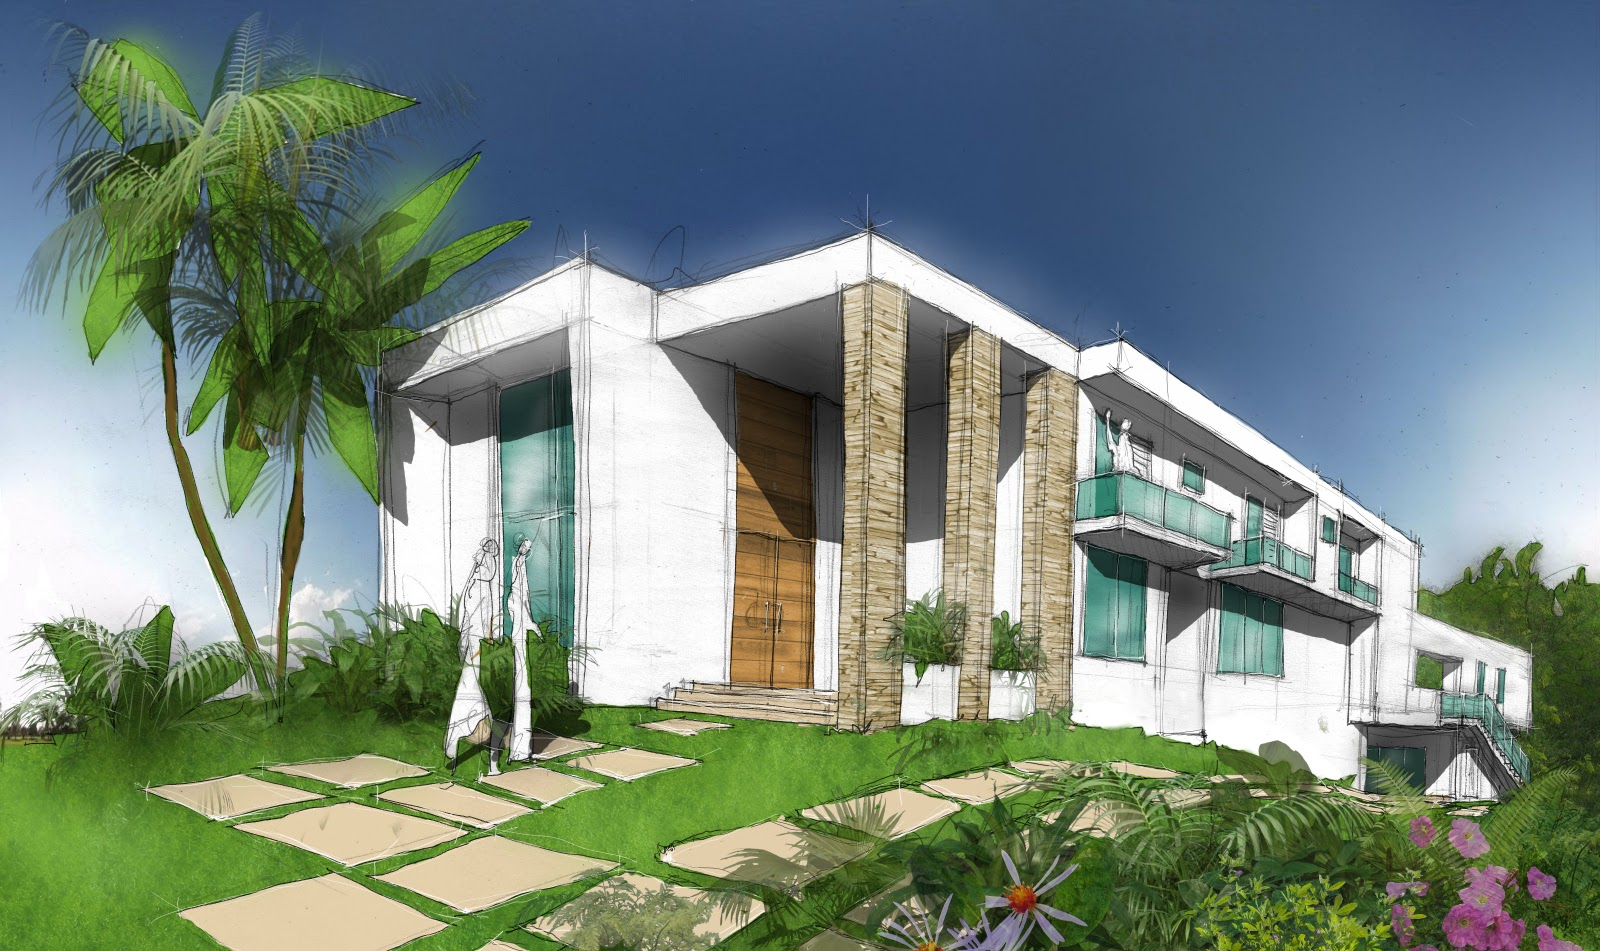 Fotos de fachadas de casas modernas e bonitas decorando - Imagenes casas modernas ...